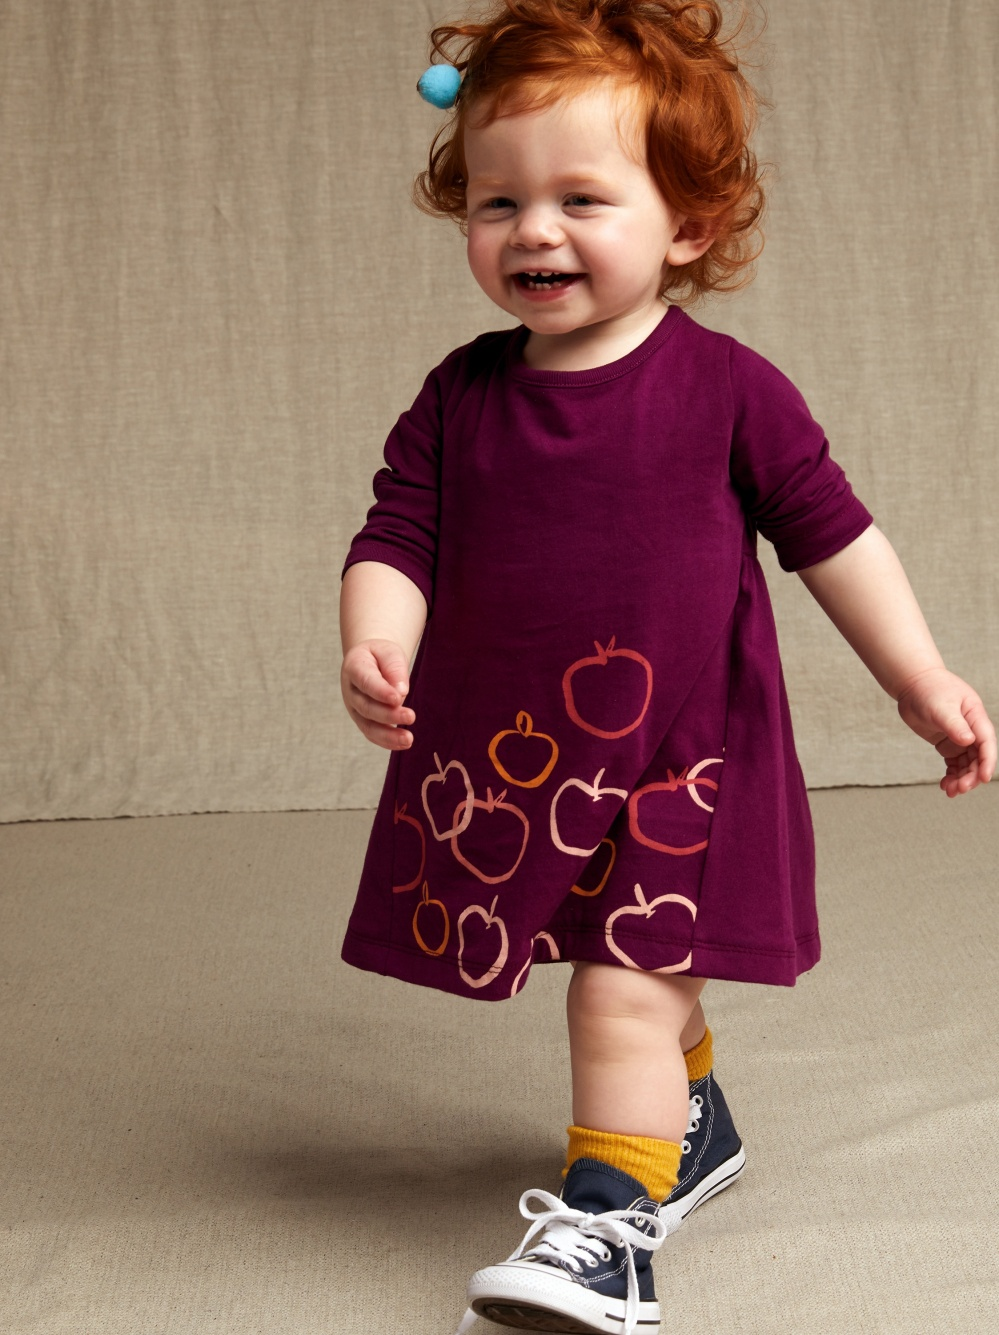 Golden Apples Graphic Baby Dress